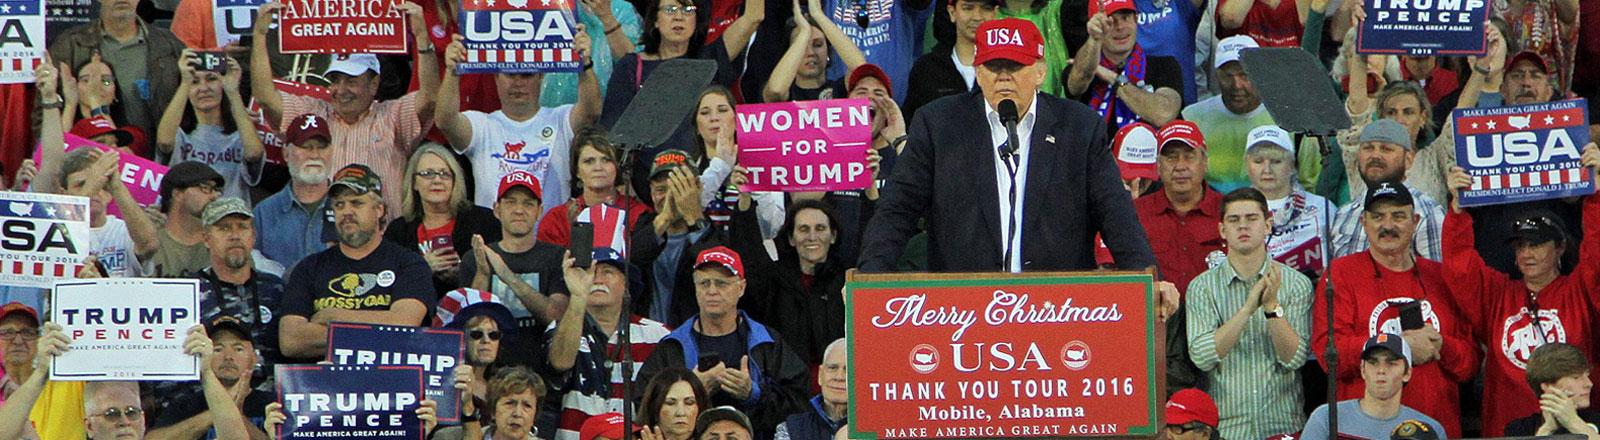 Donald Trump bei der Thank You Tour 2016